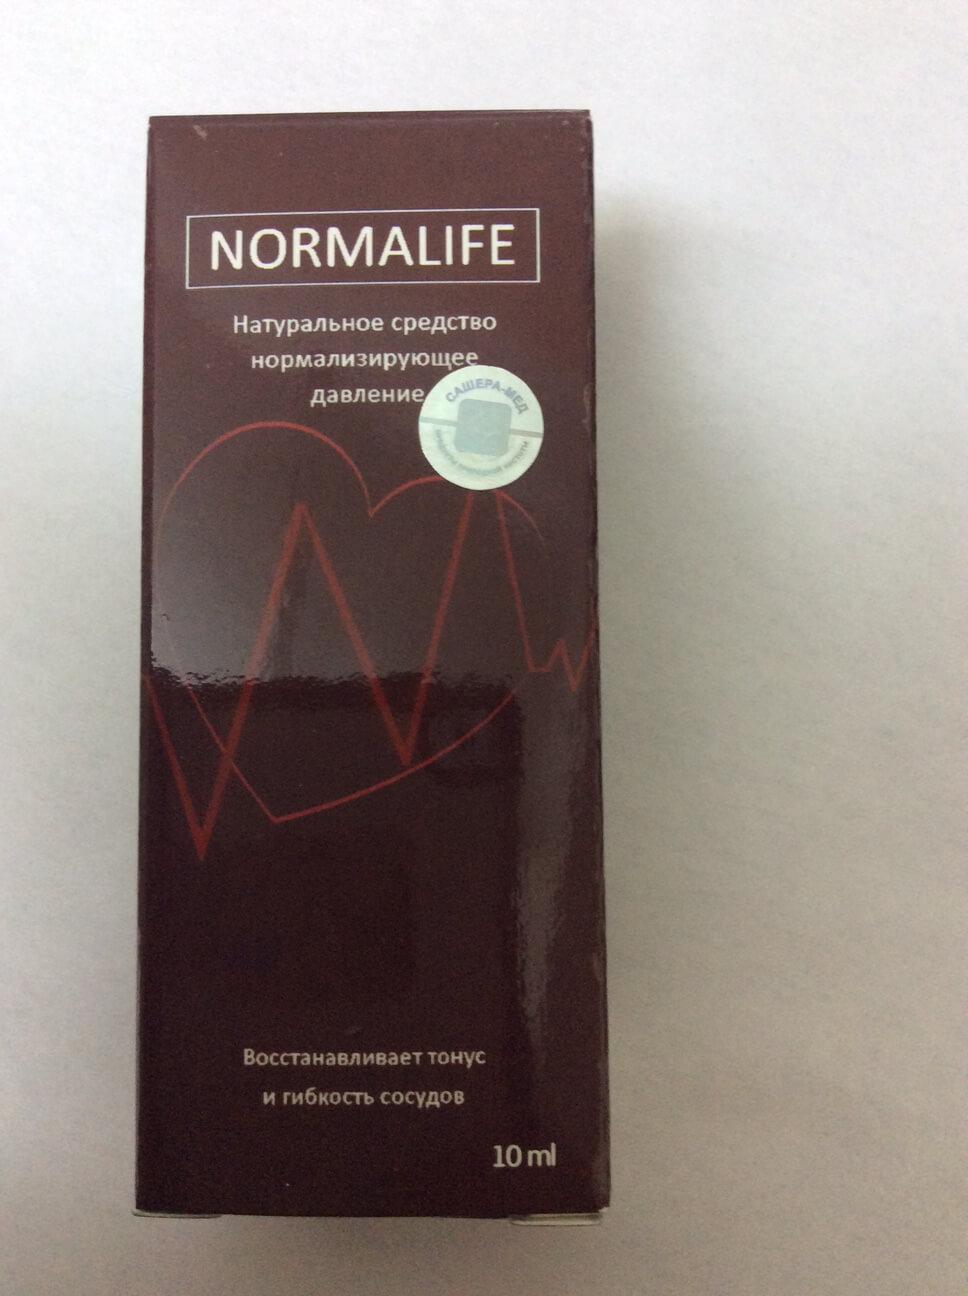 Бад нормалайф (normalife) отзывы при лечении гипертонии